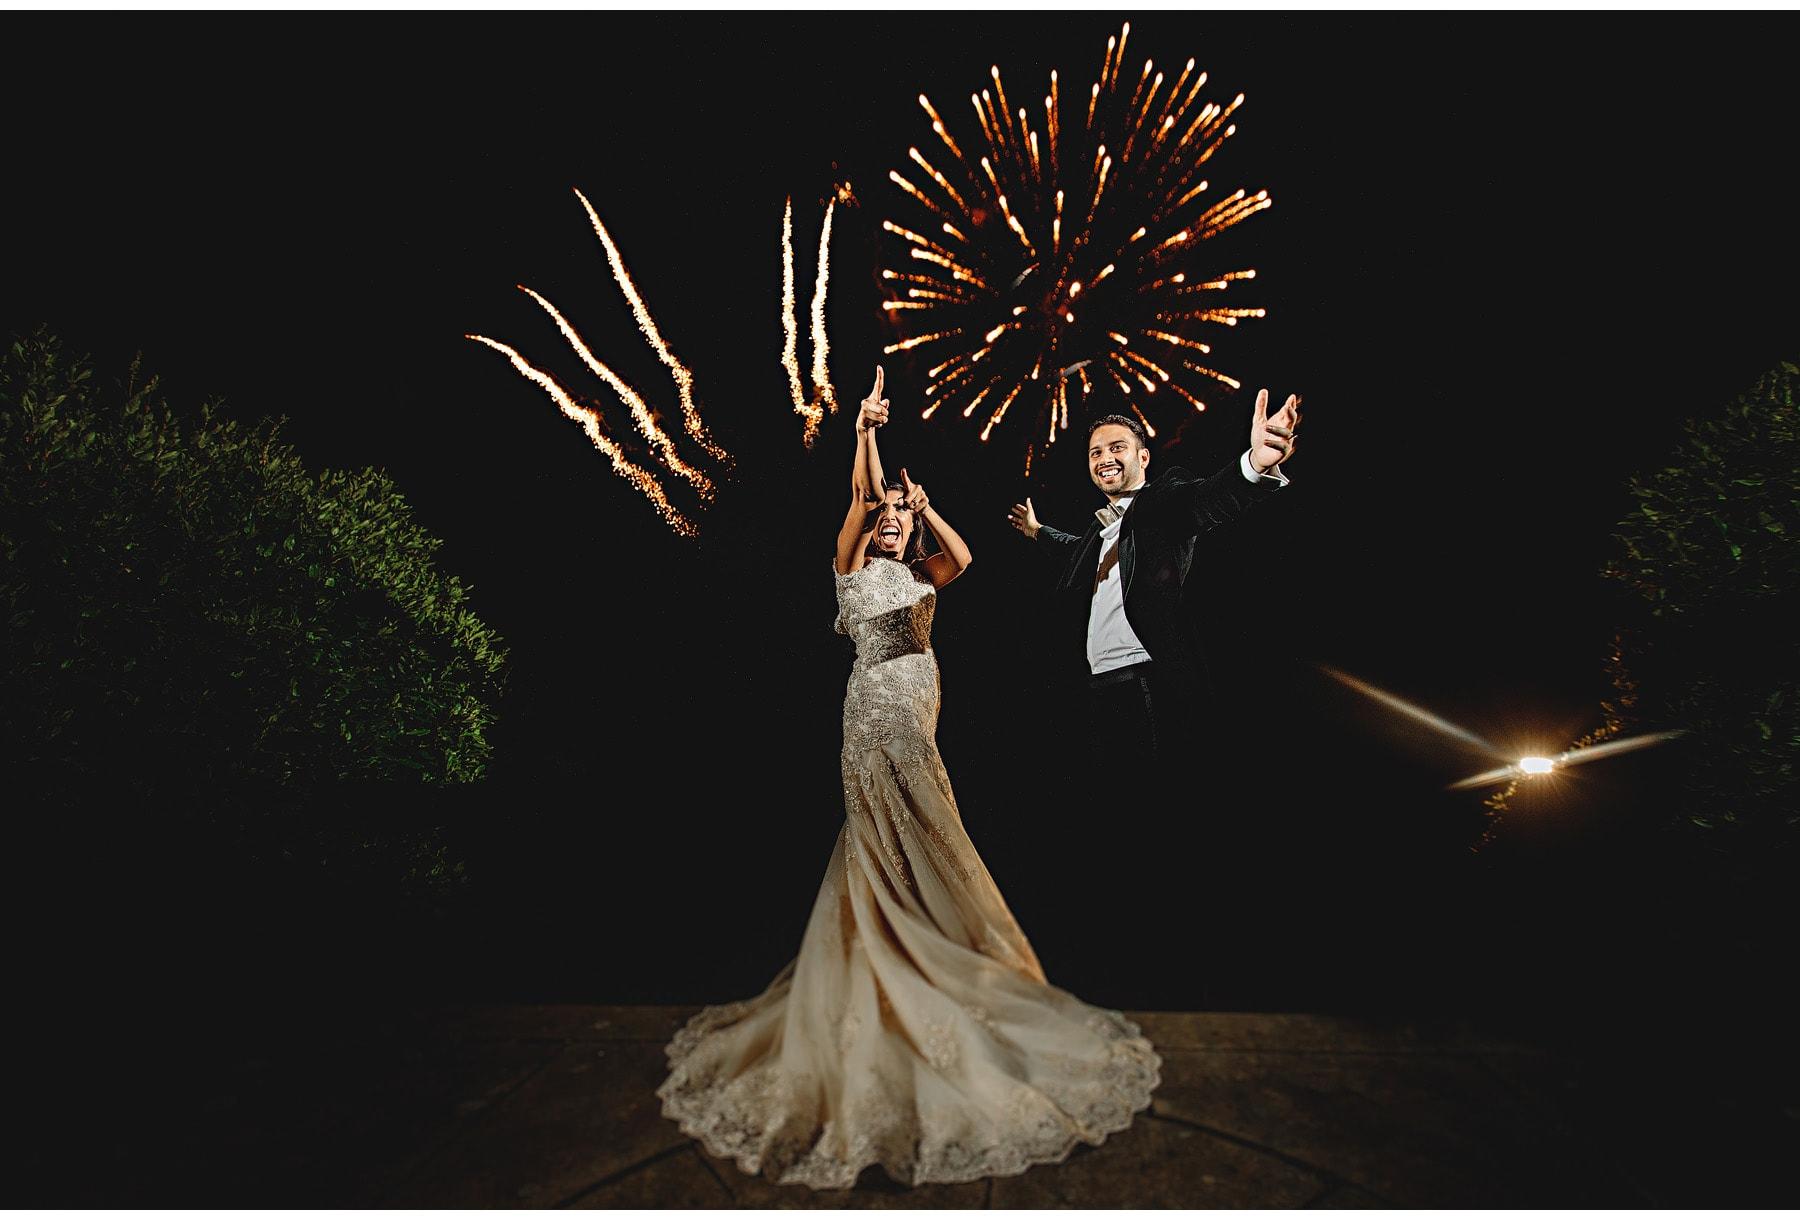 the bride & groom loving the fireworks.